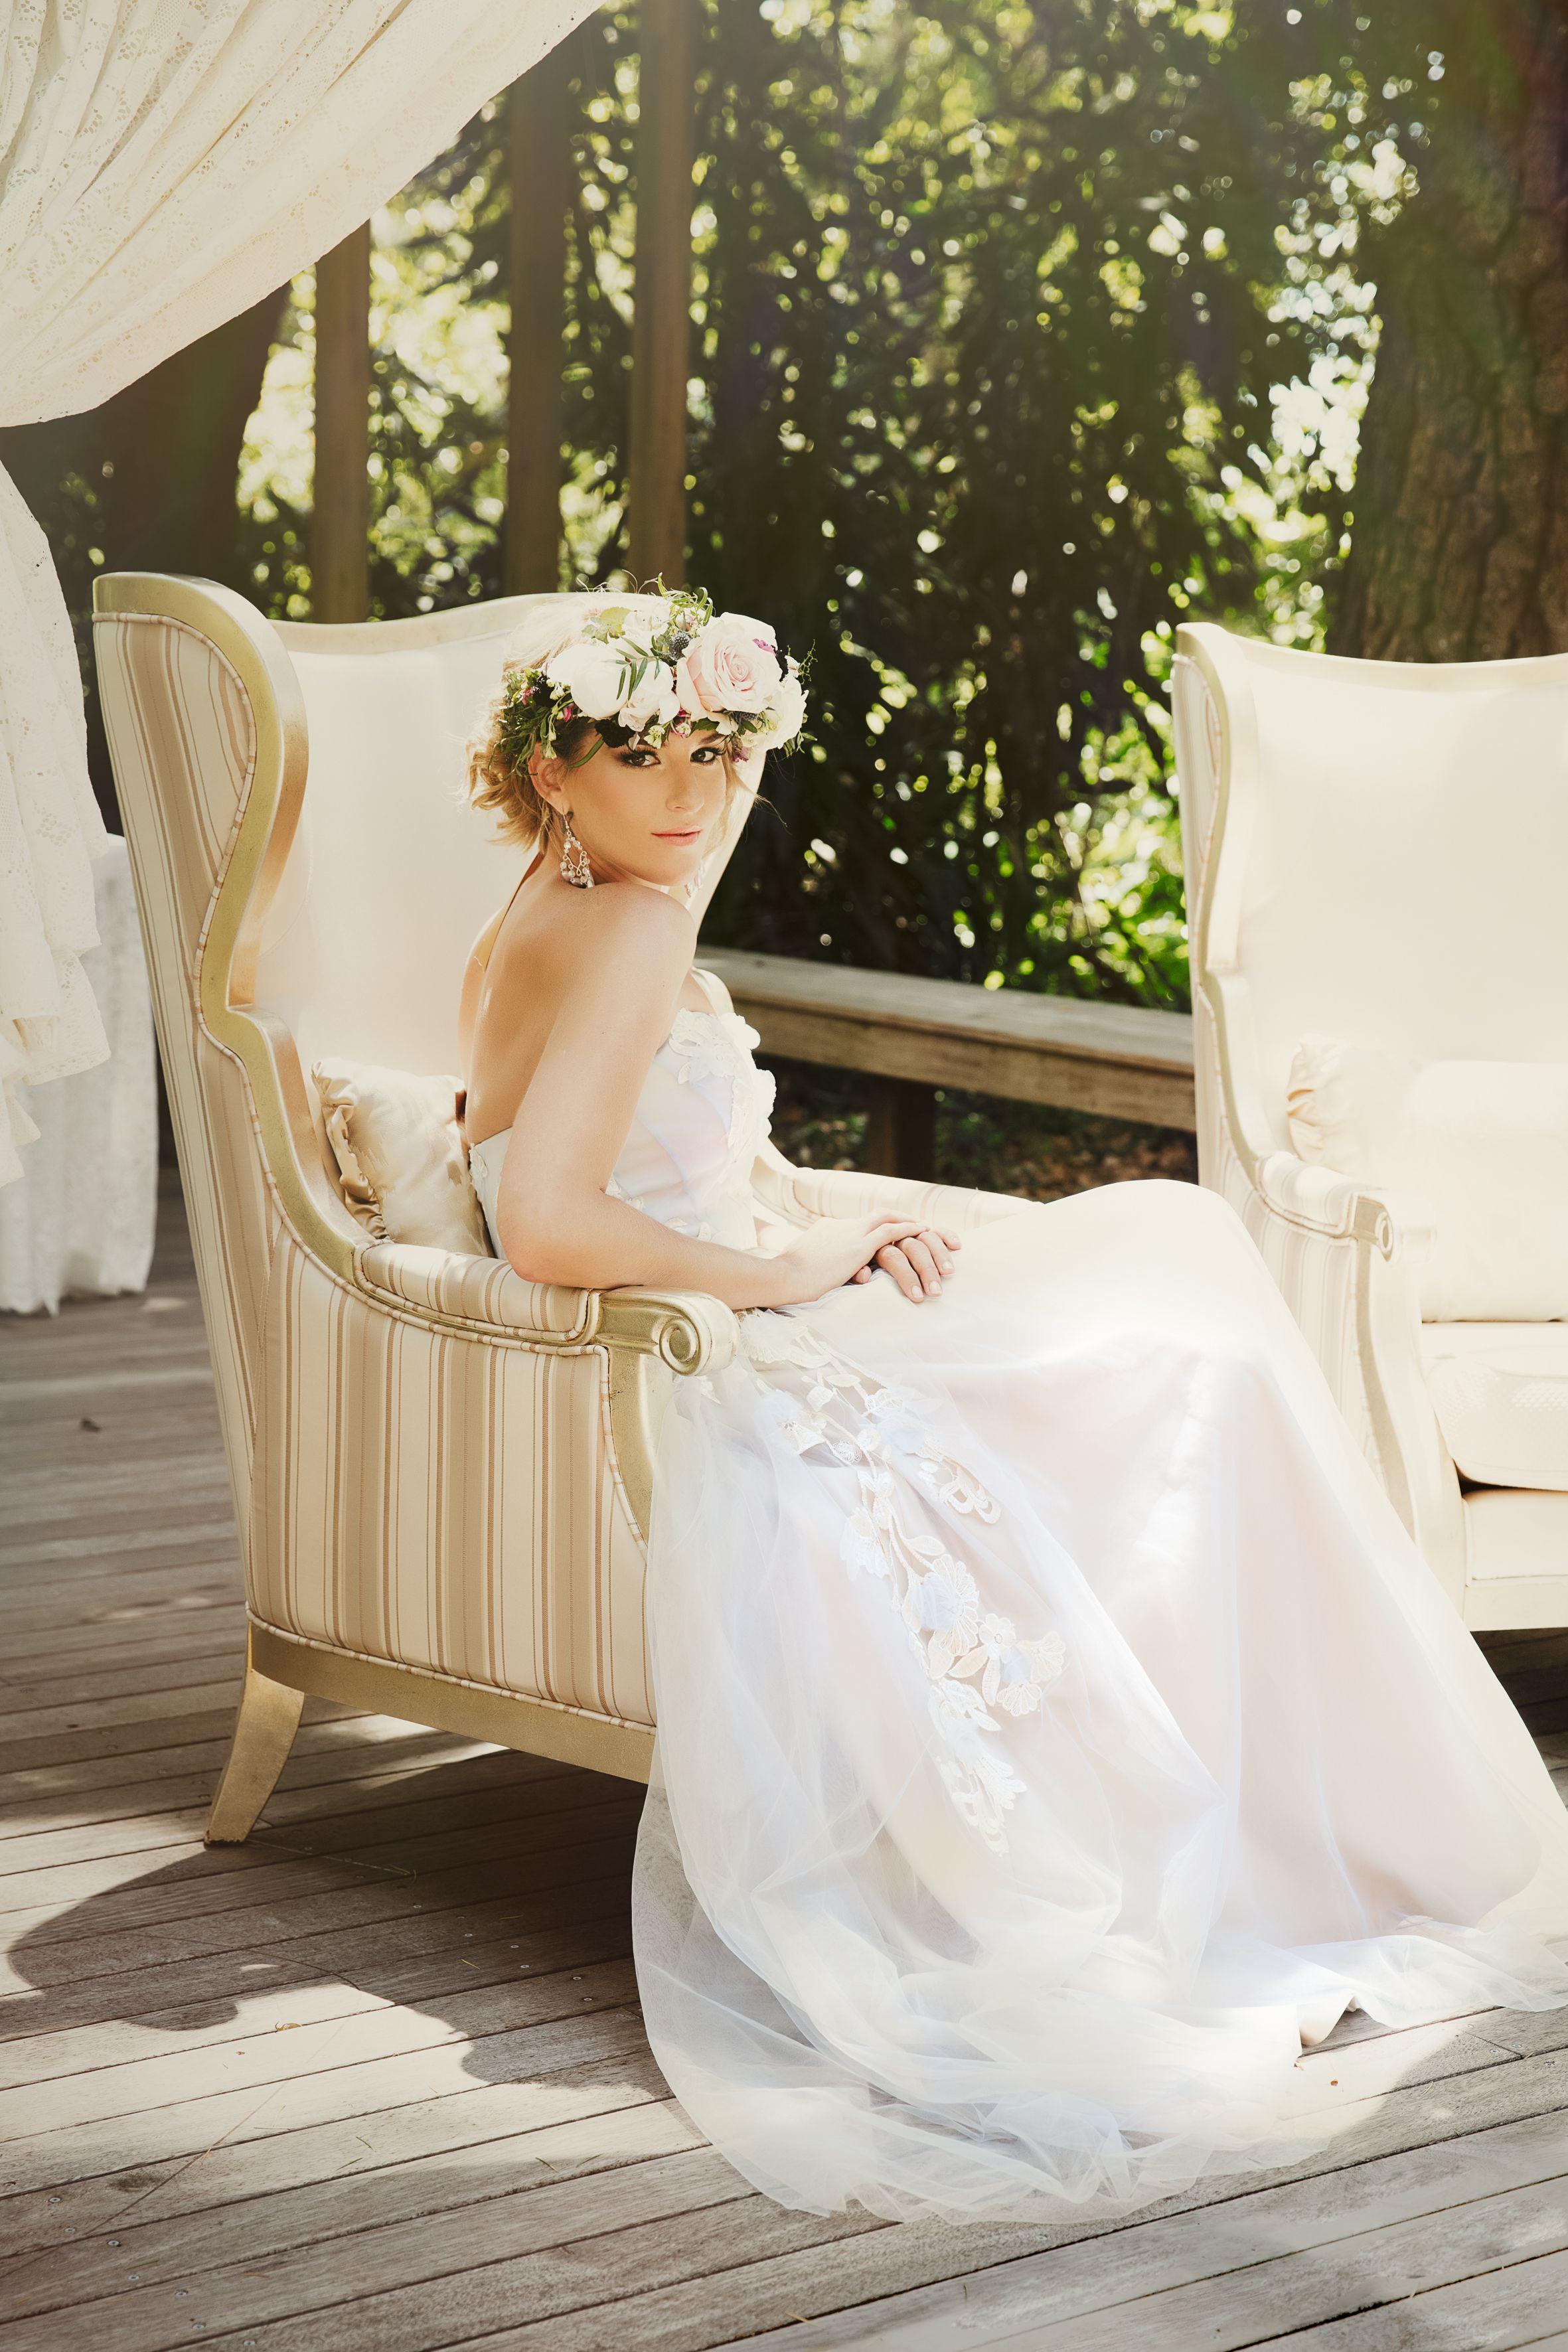 Lilly in 2019 | Sweet Angels Bridal Australia Wedding